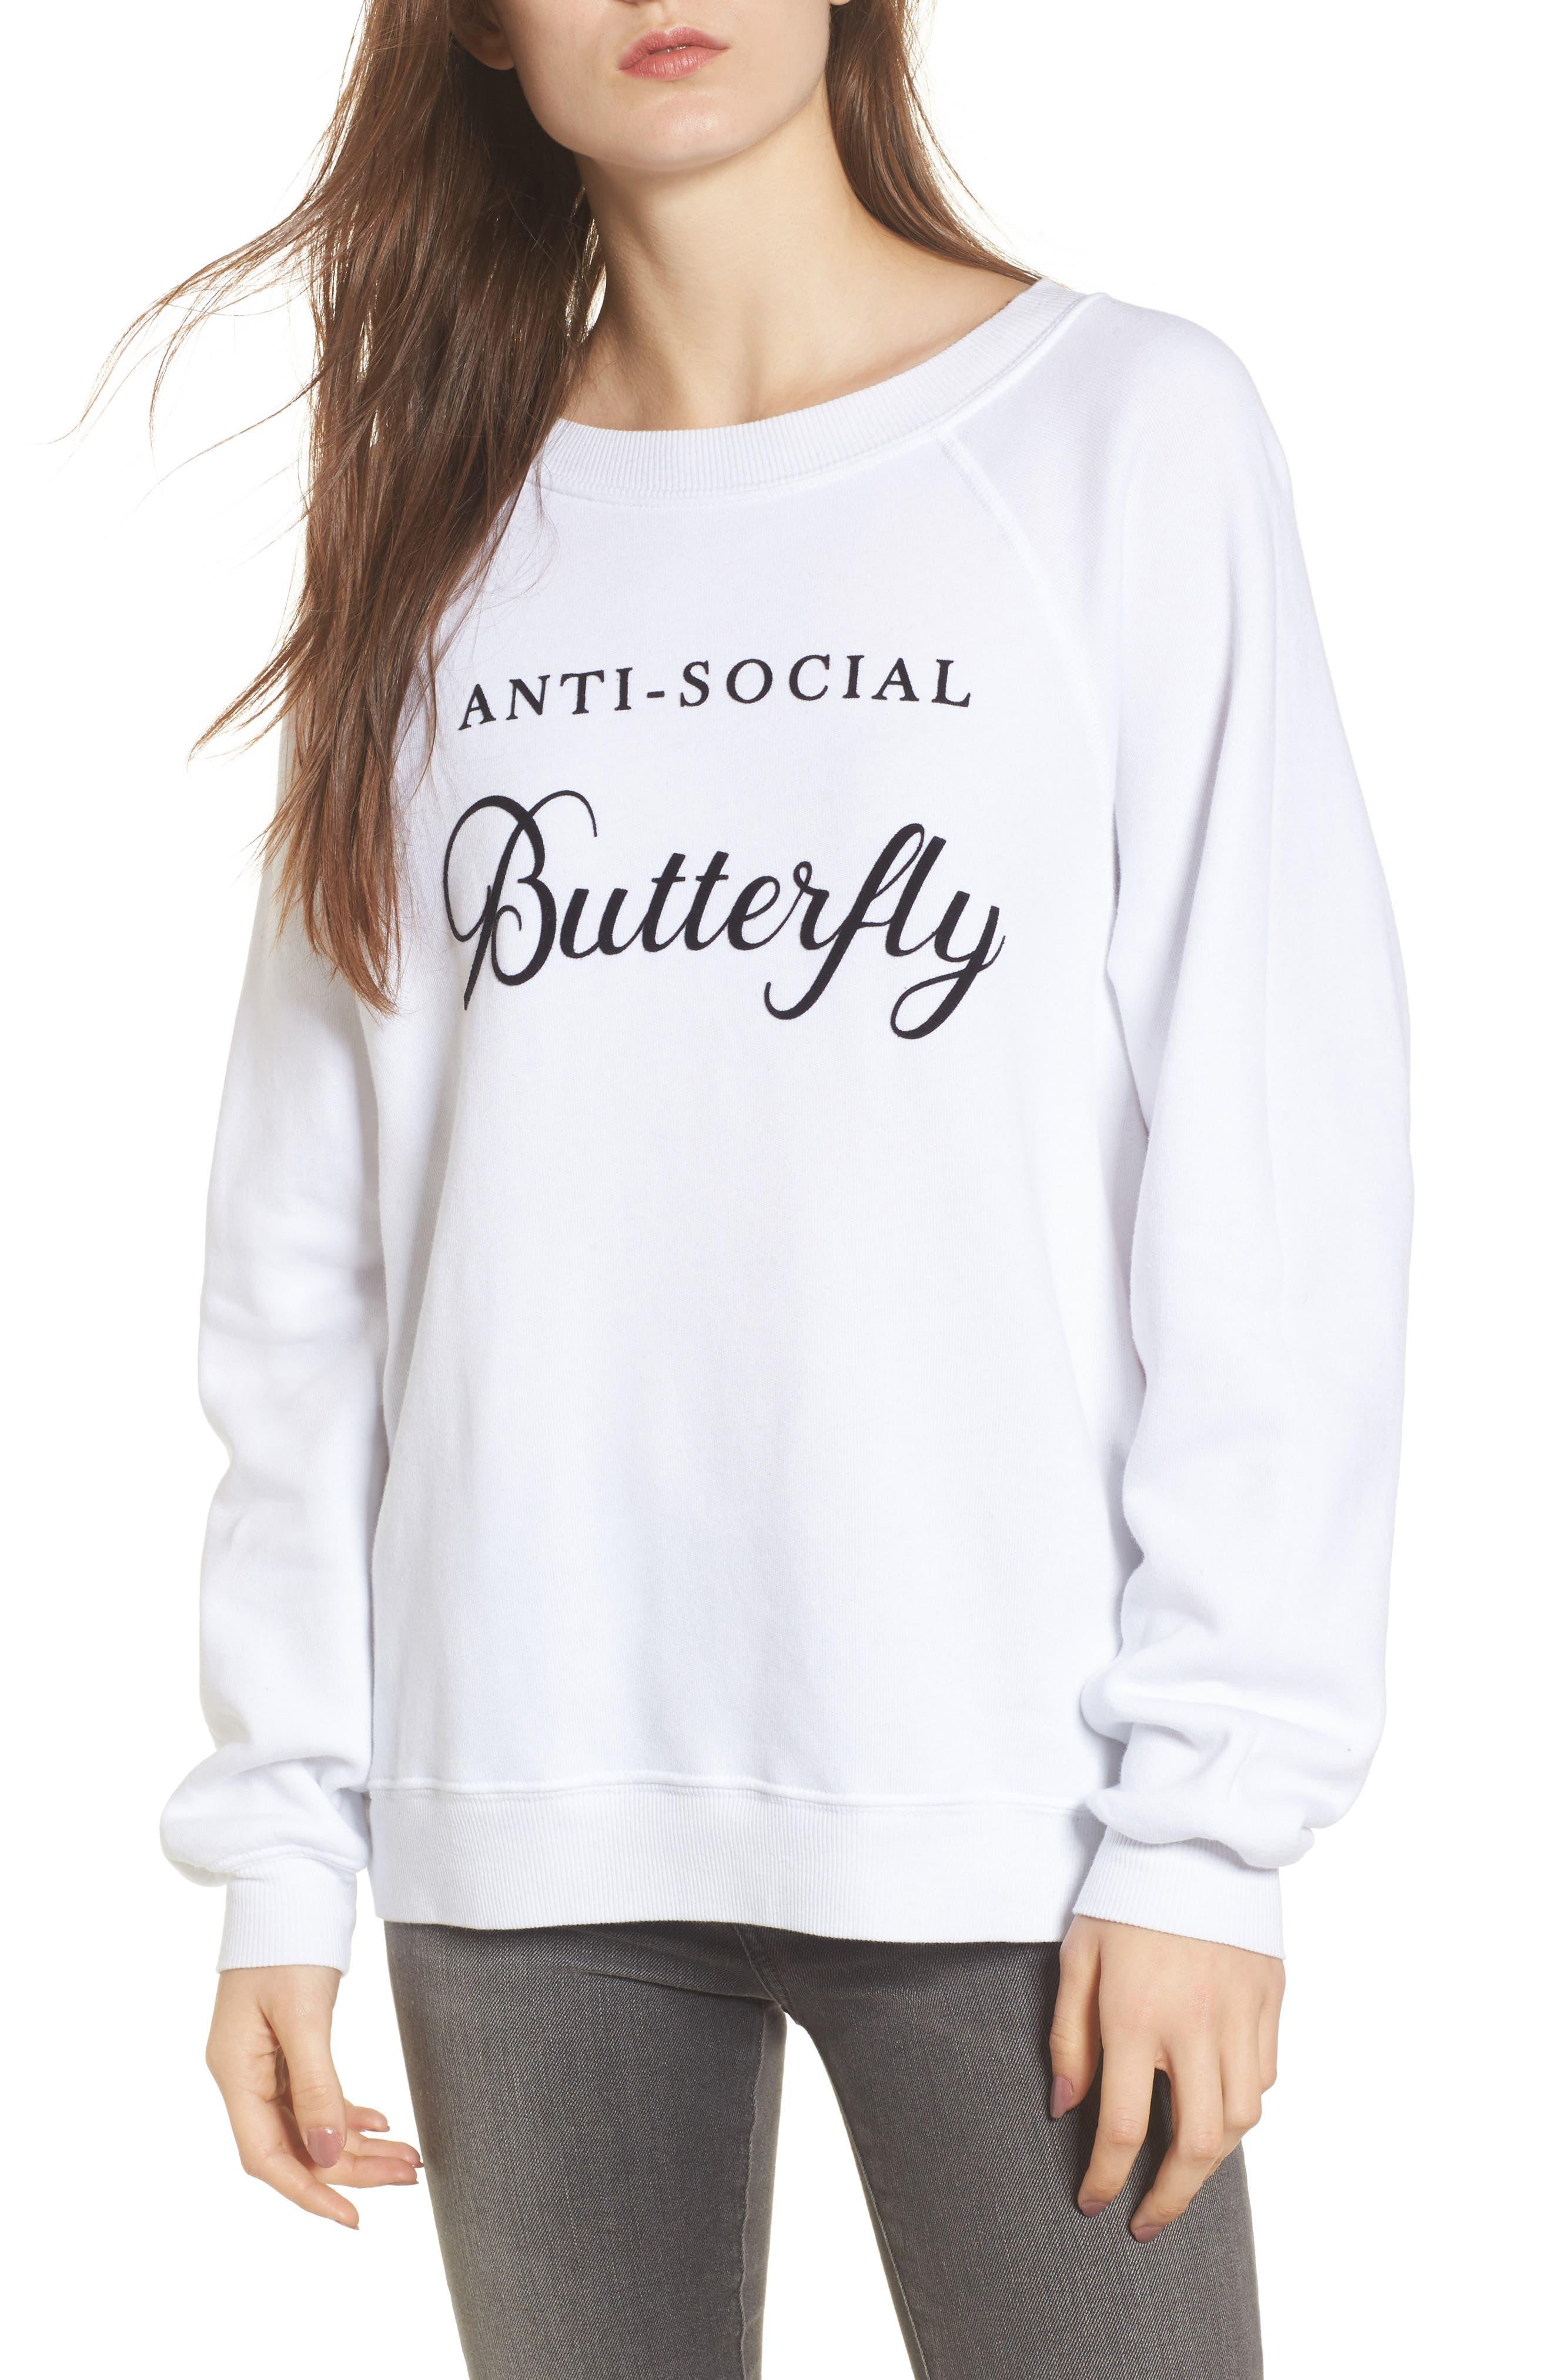 Main Image - Wildfox Anti-Social Butterfly Sweatshirt